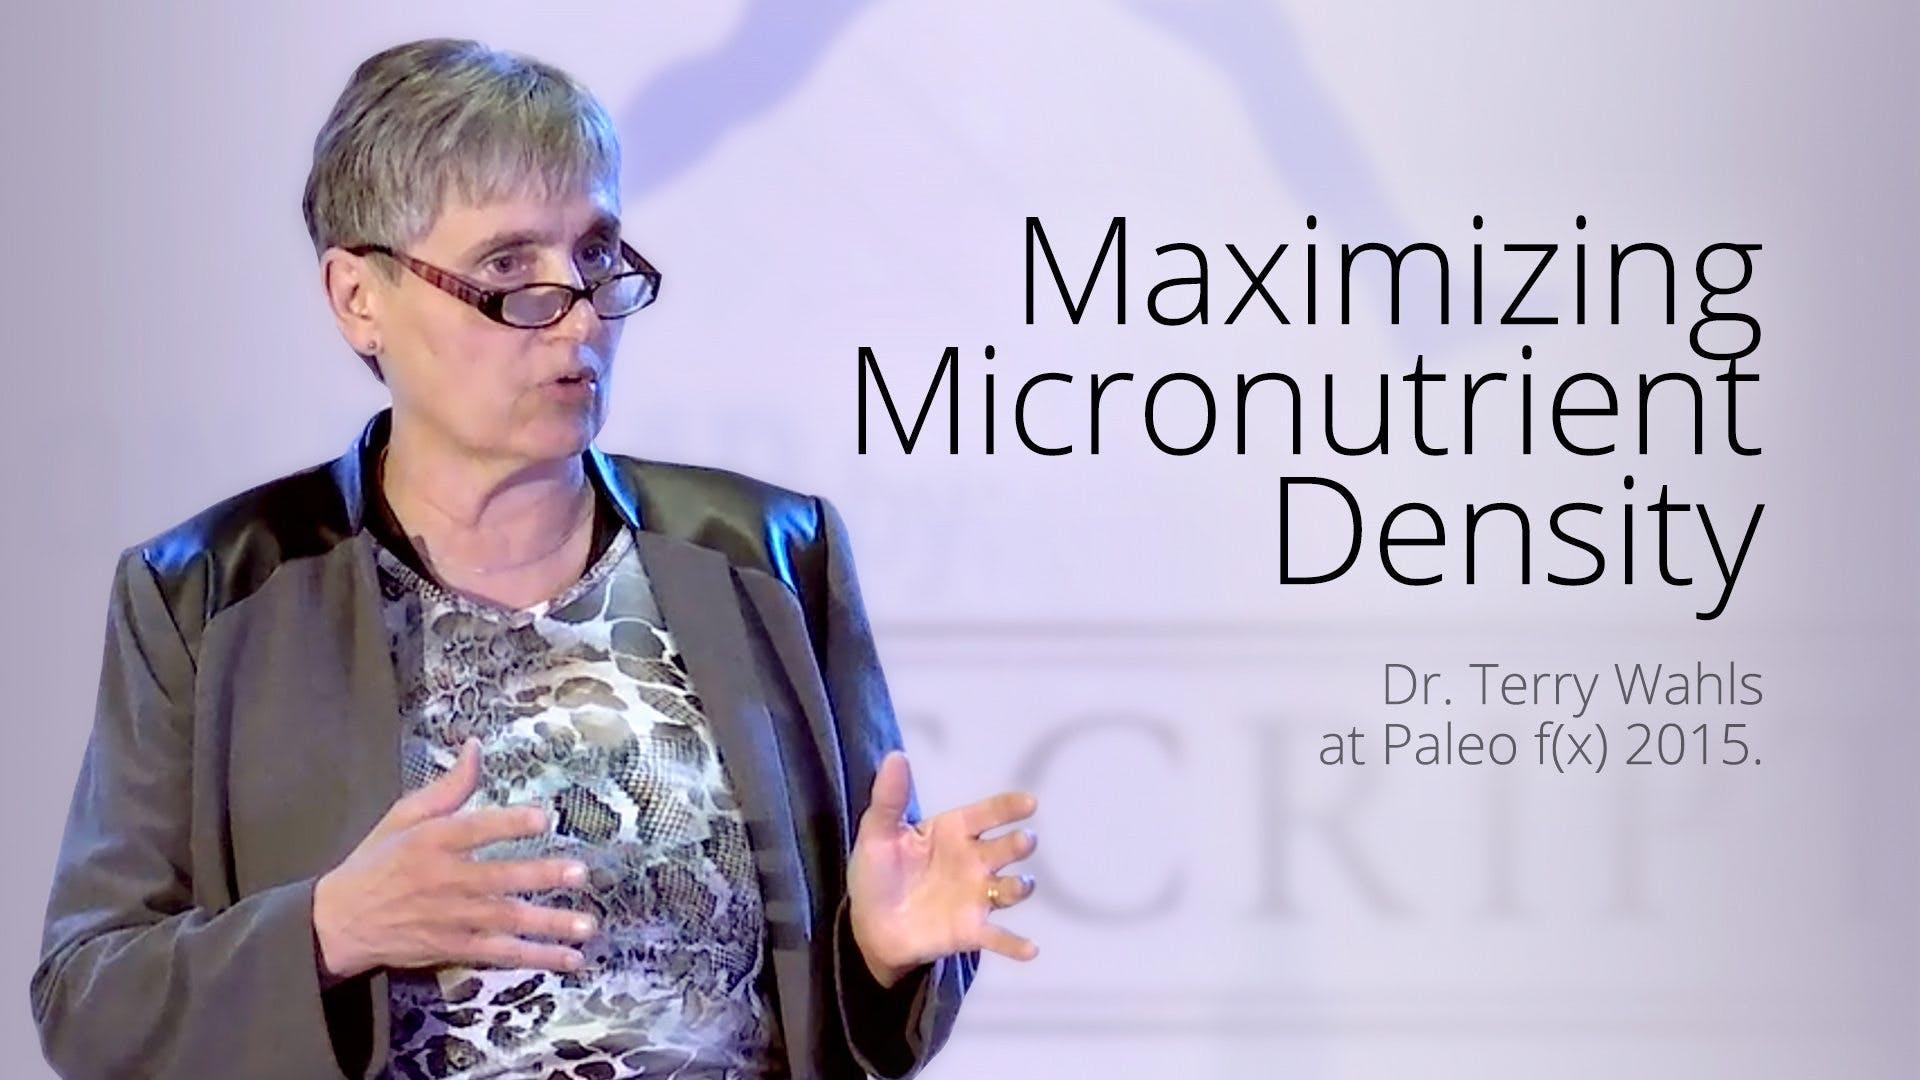 Maximizing Micronutrient Density